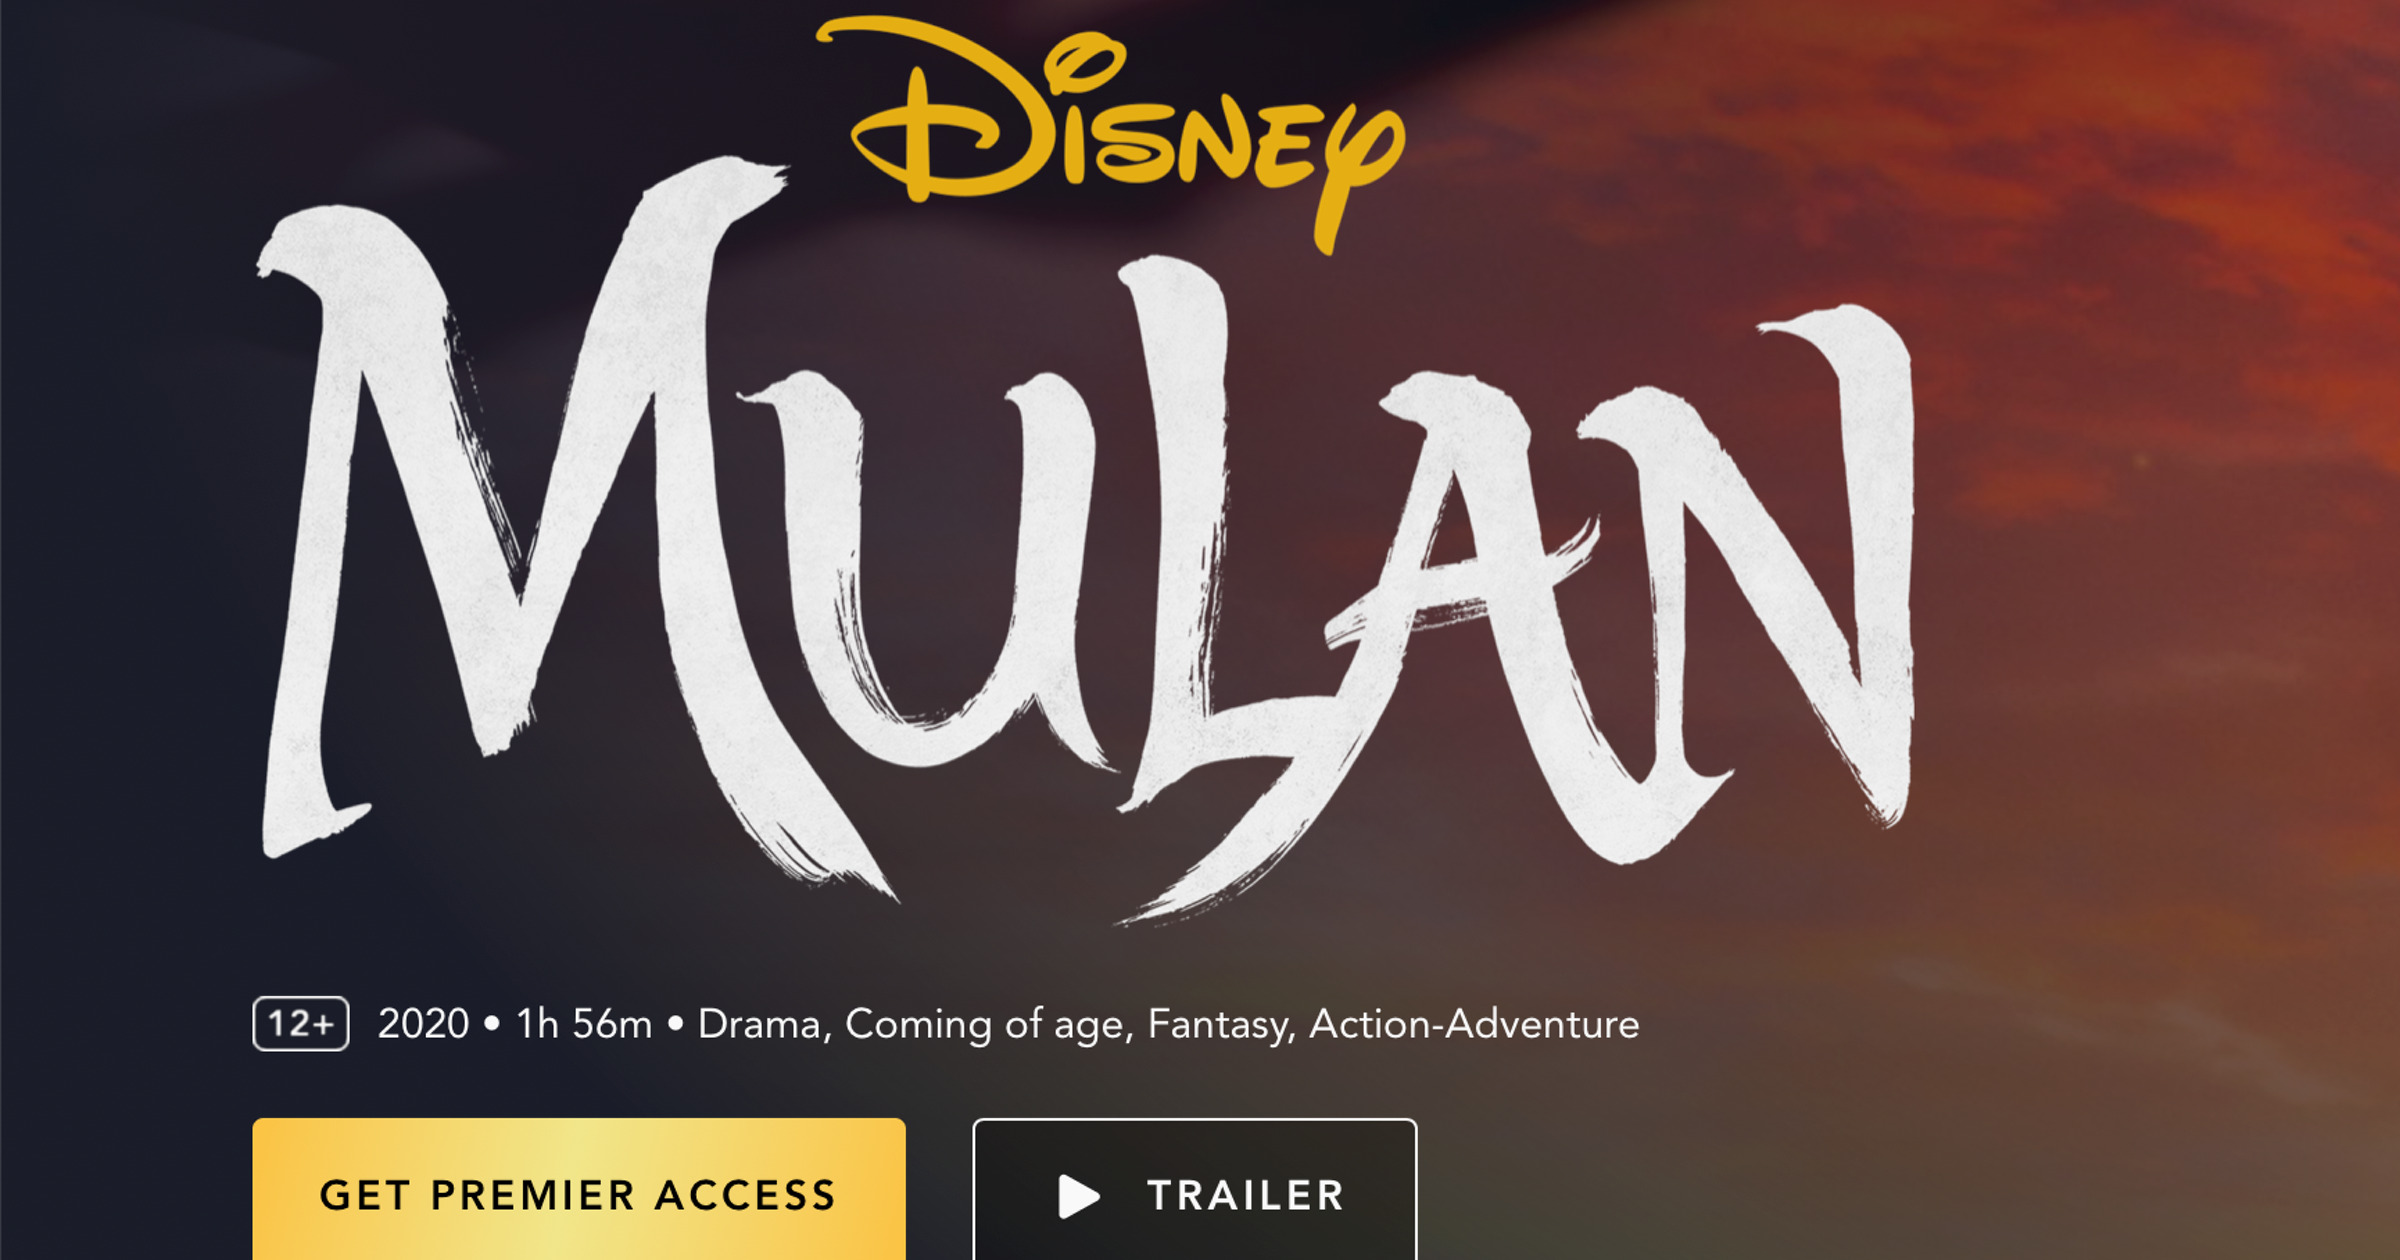 Disney+ Mulan Premier Access